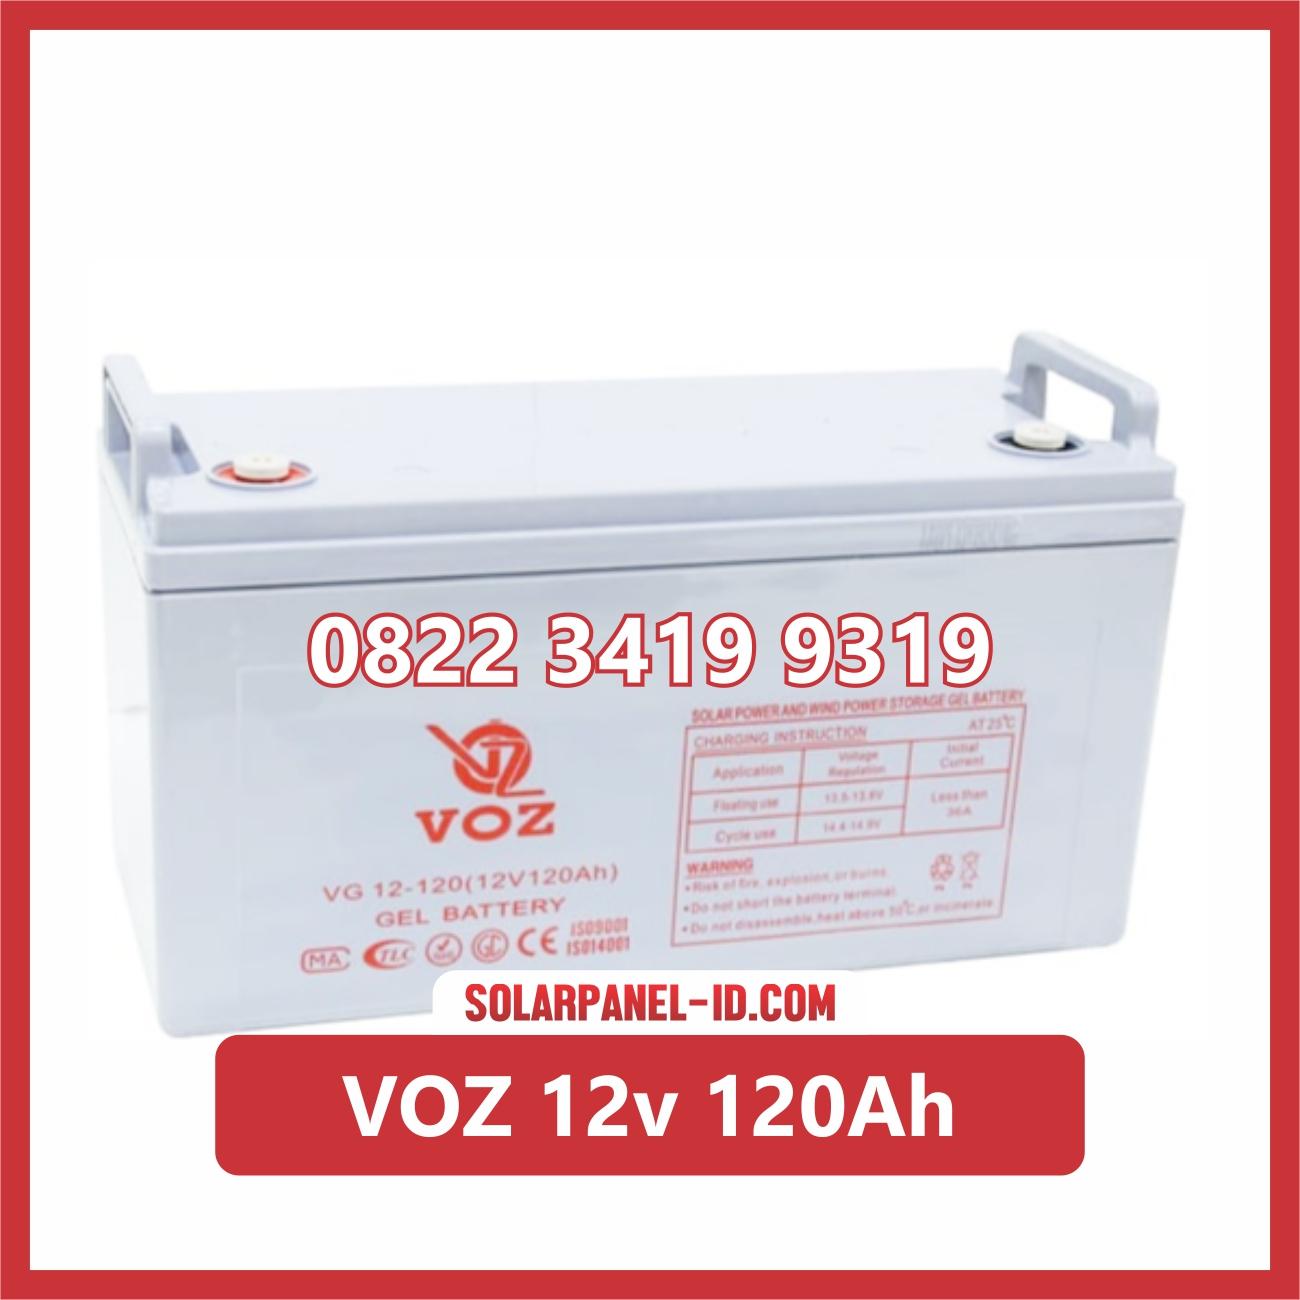 VOZ baterai kering 12v 120ah baterai panel surya